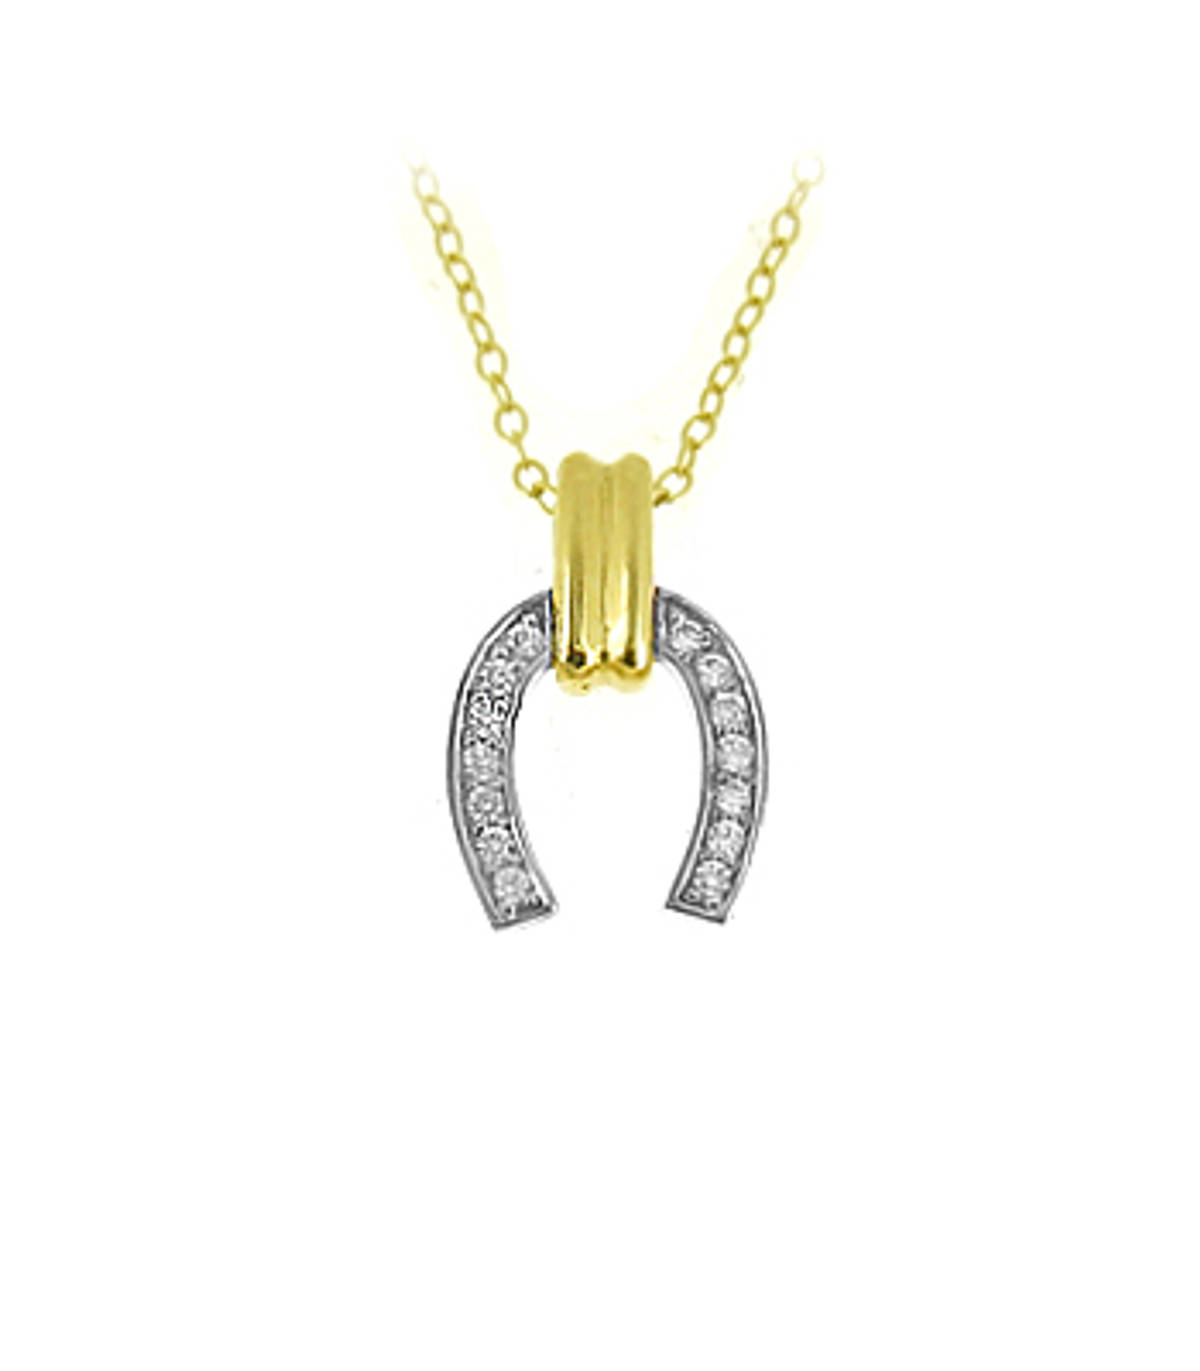 "9k yellow gold CZ horseshoe pendant on 9k yellow gold 18"" chain Metal: 9k yellow gold  9k yellow gold 18"" chain Length  1.5cm Width  1cm      Made in Ireland"